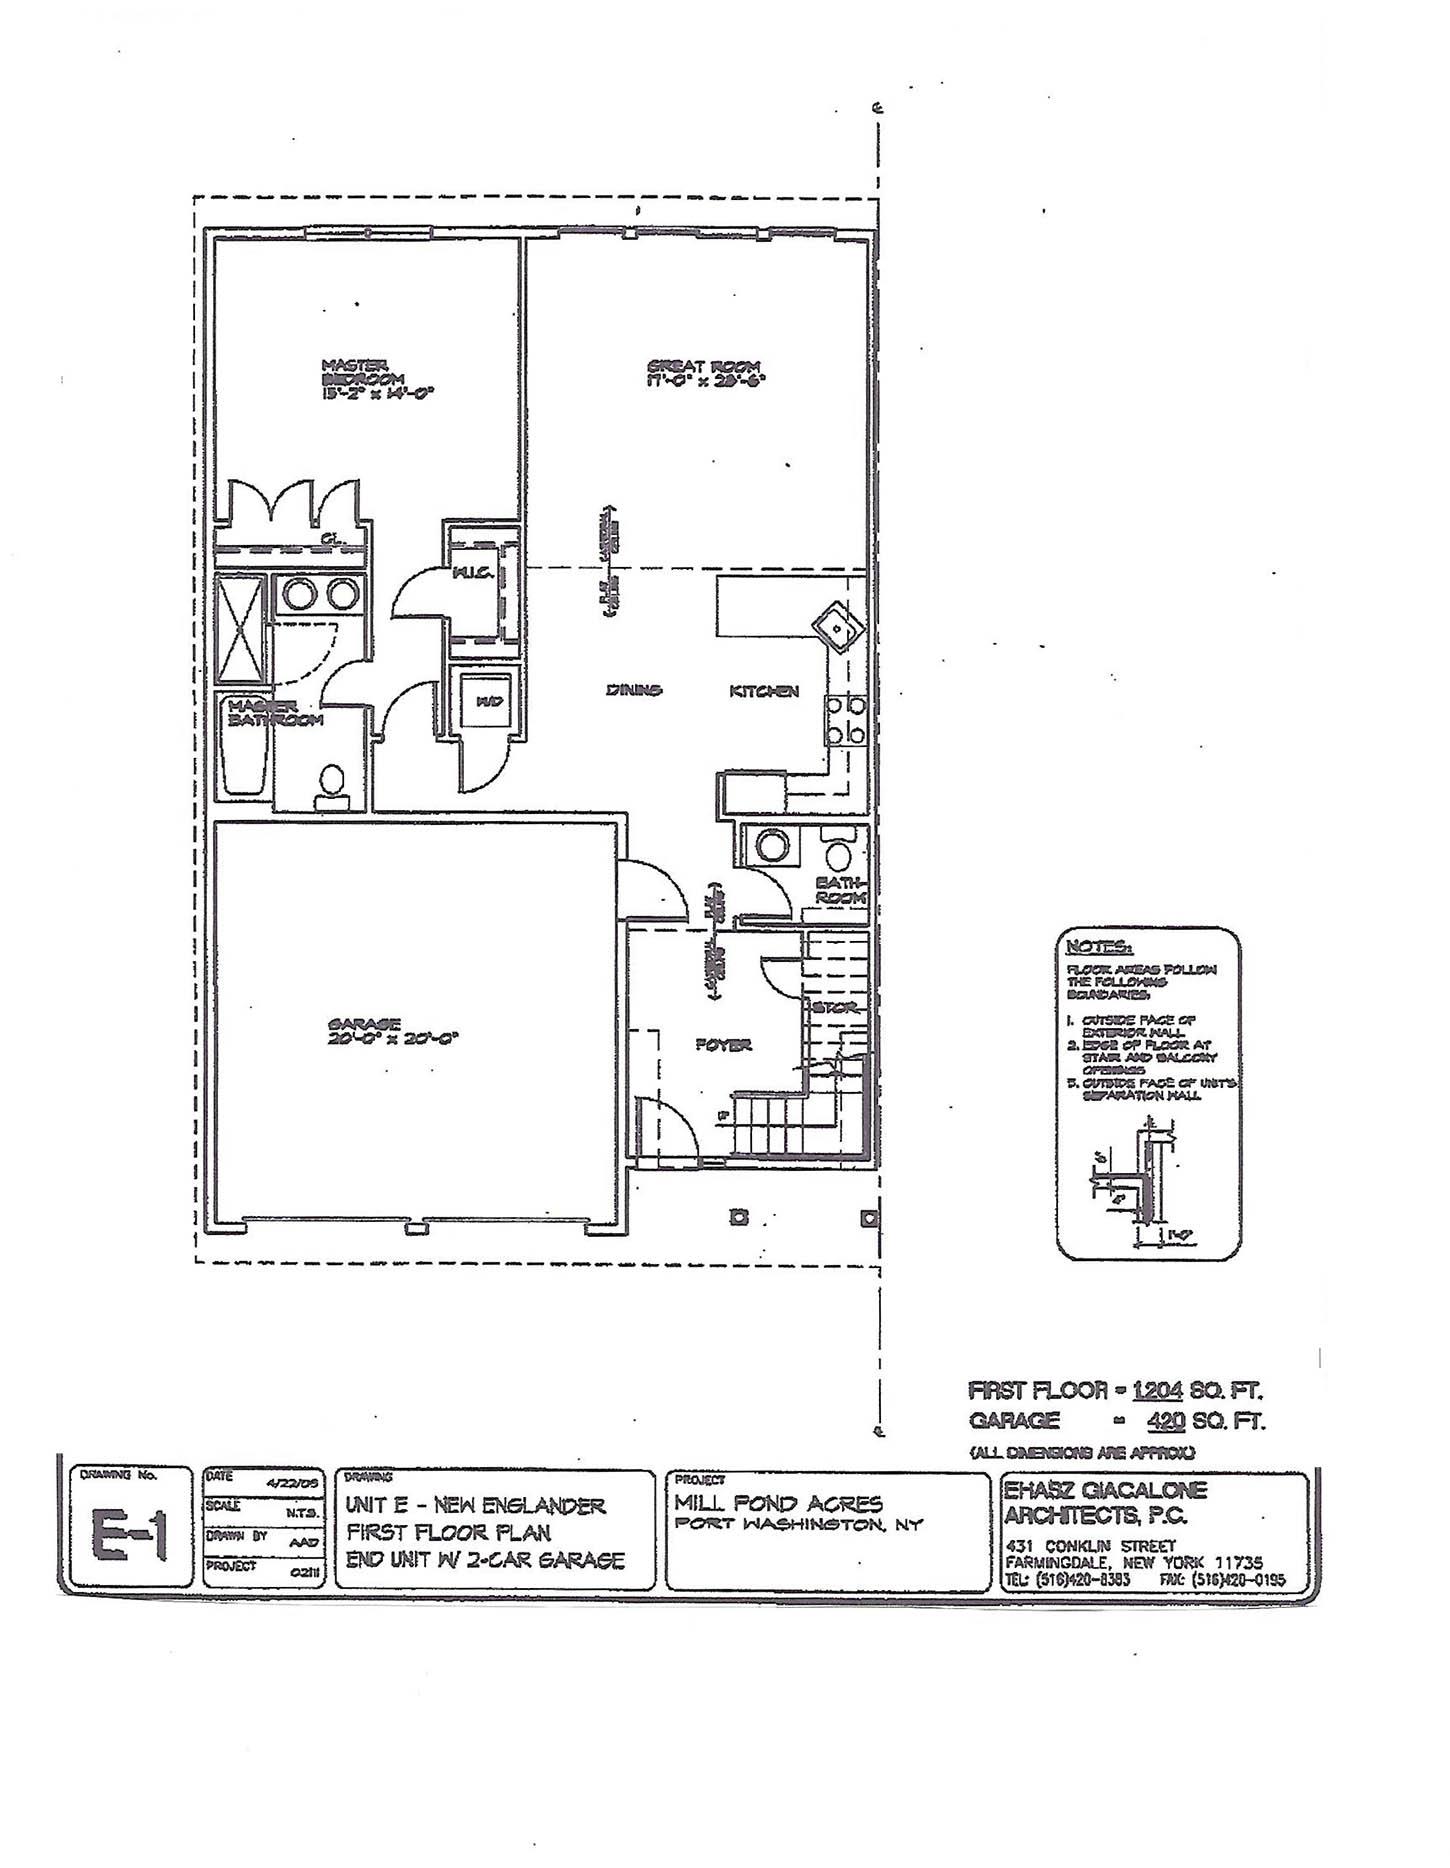 New England Townhouse floor plan